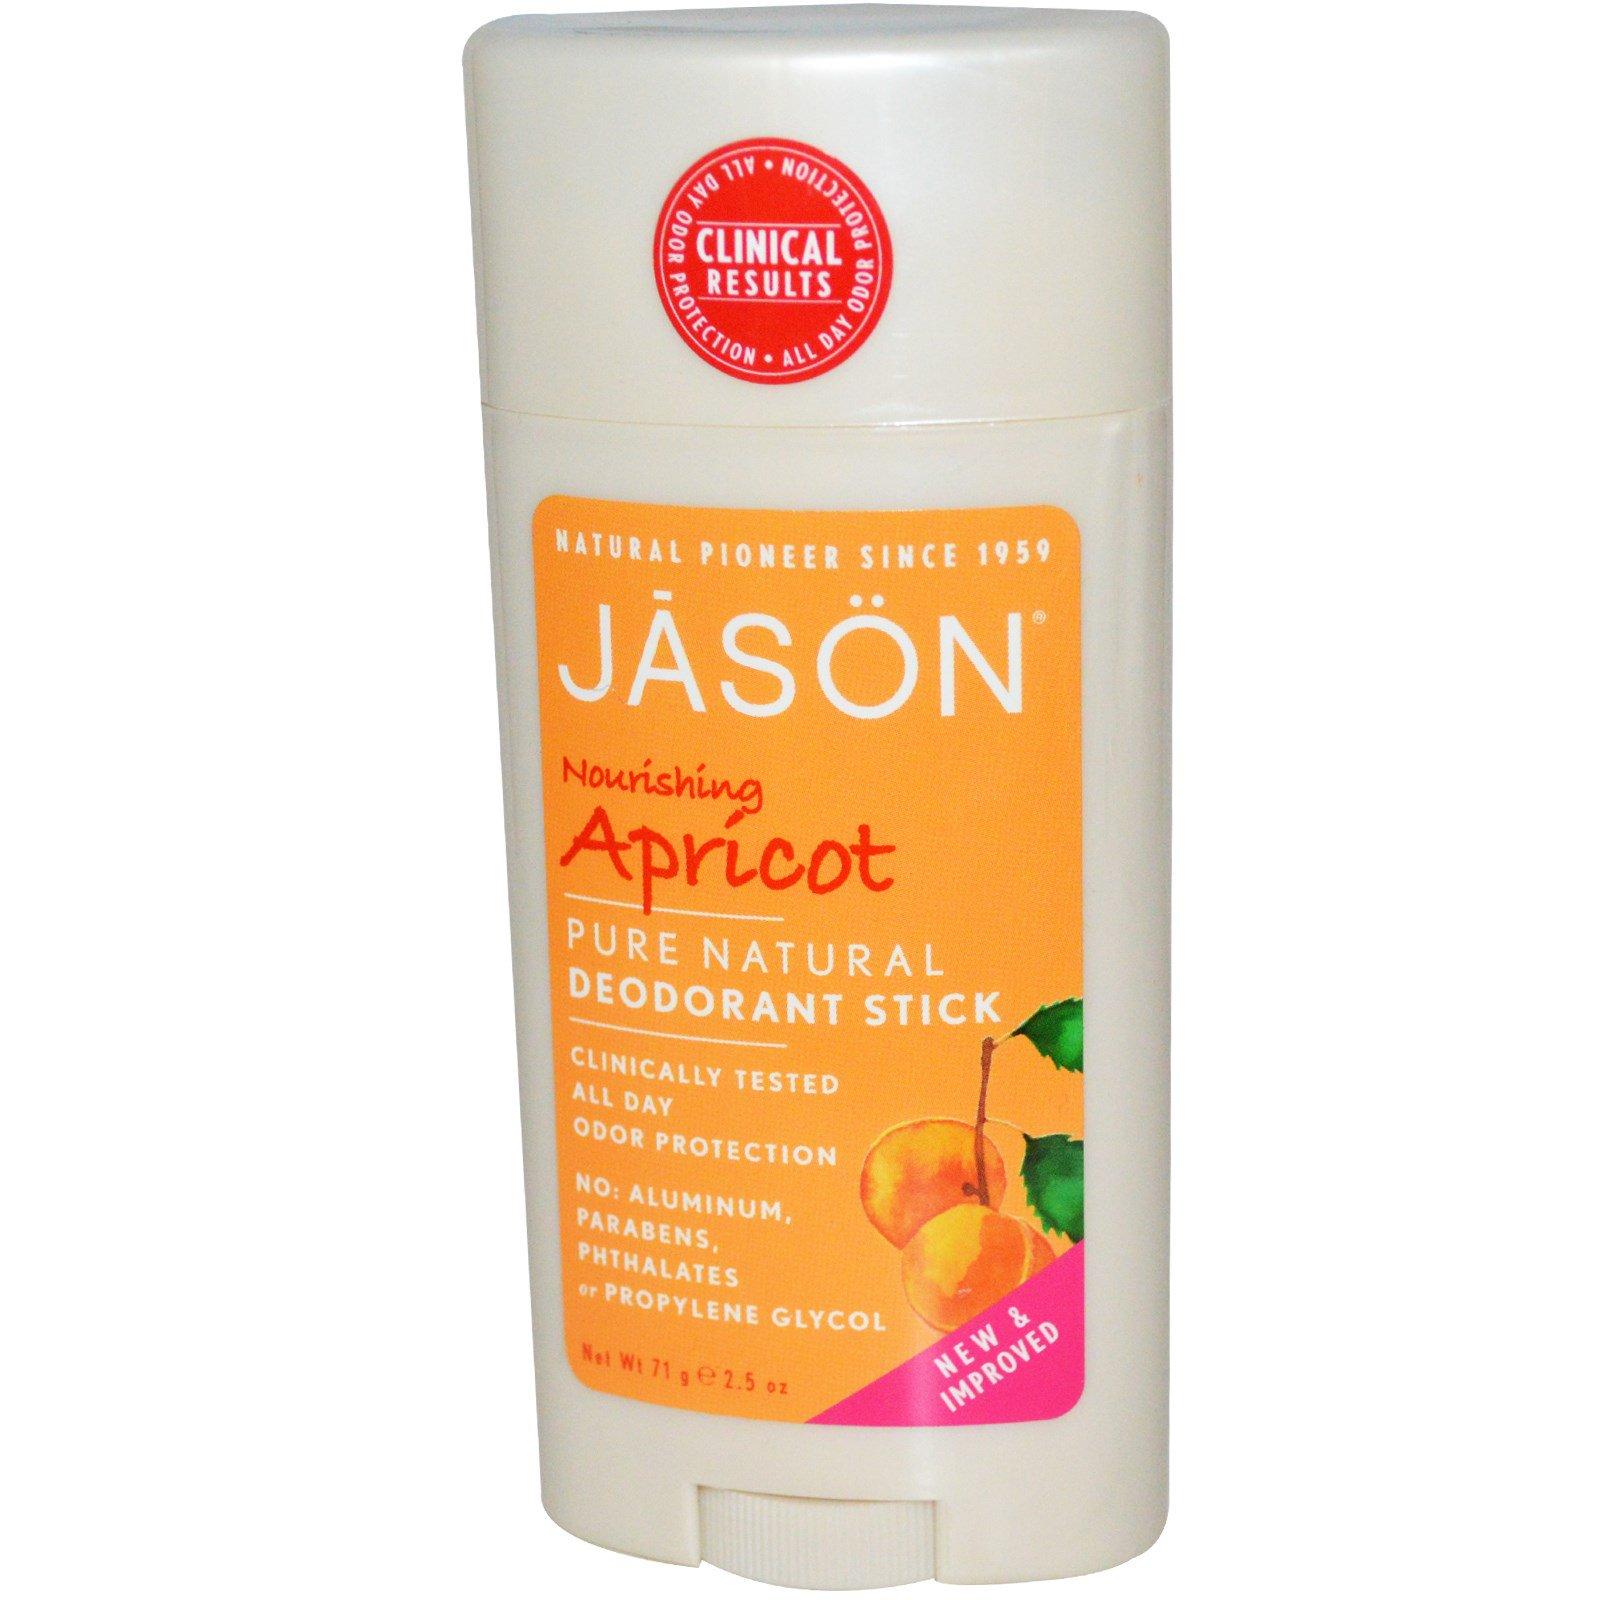 Jason Natural, Дезодорирующий карандаш, Питательный абрикос, 2,5 унции (71 г)